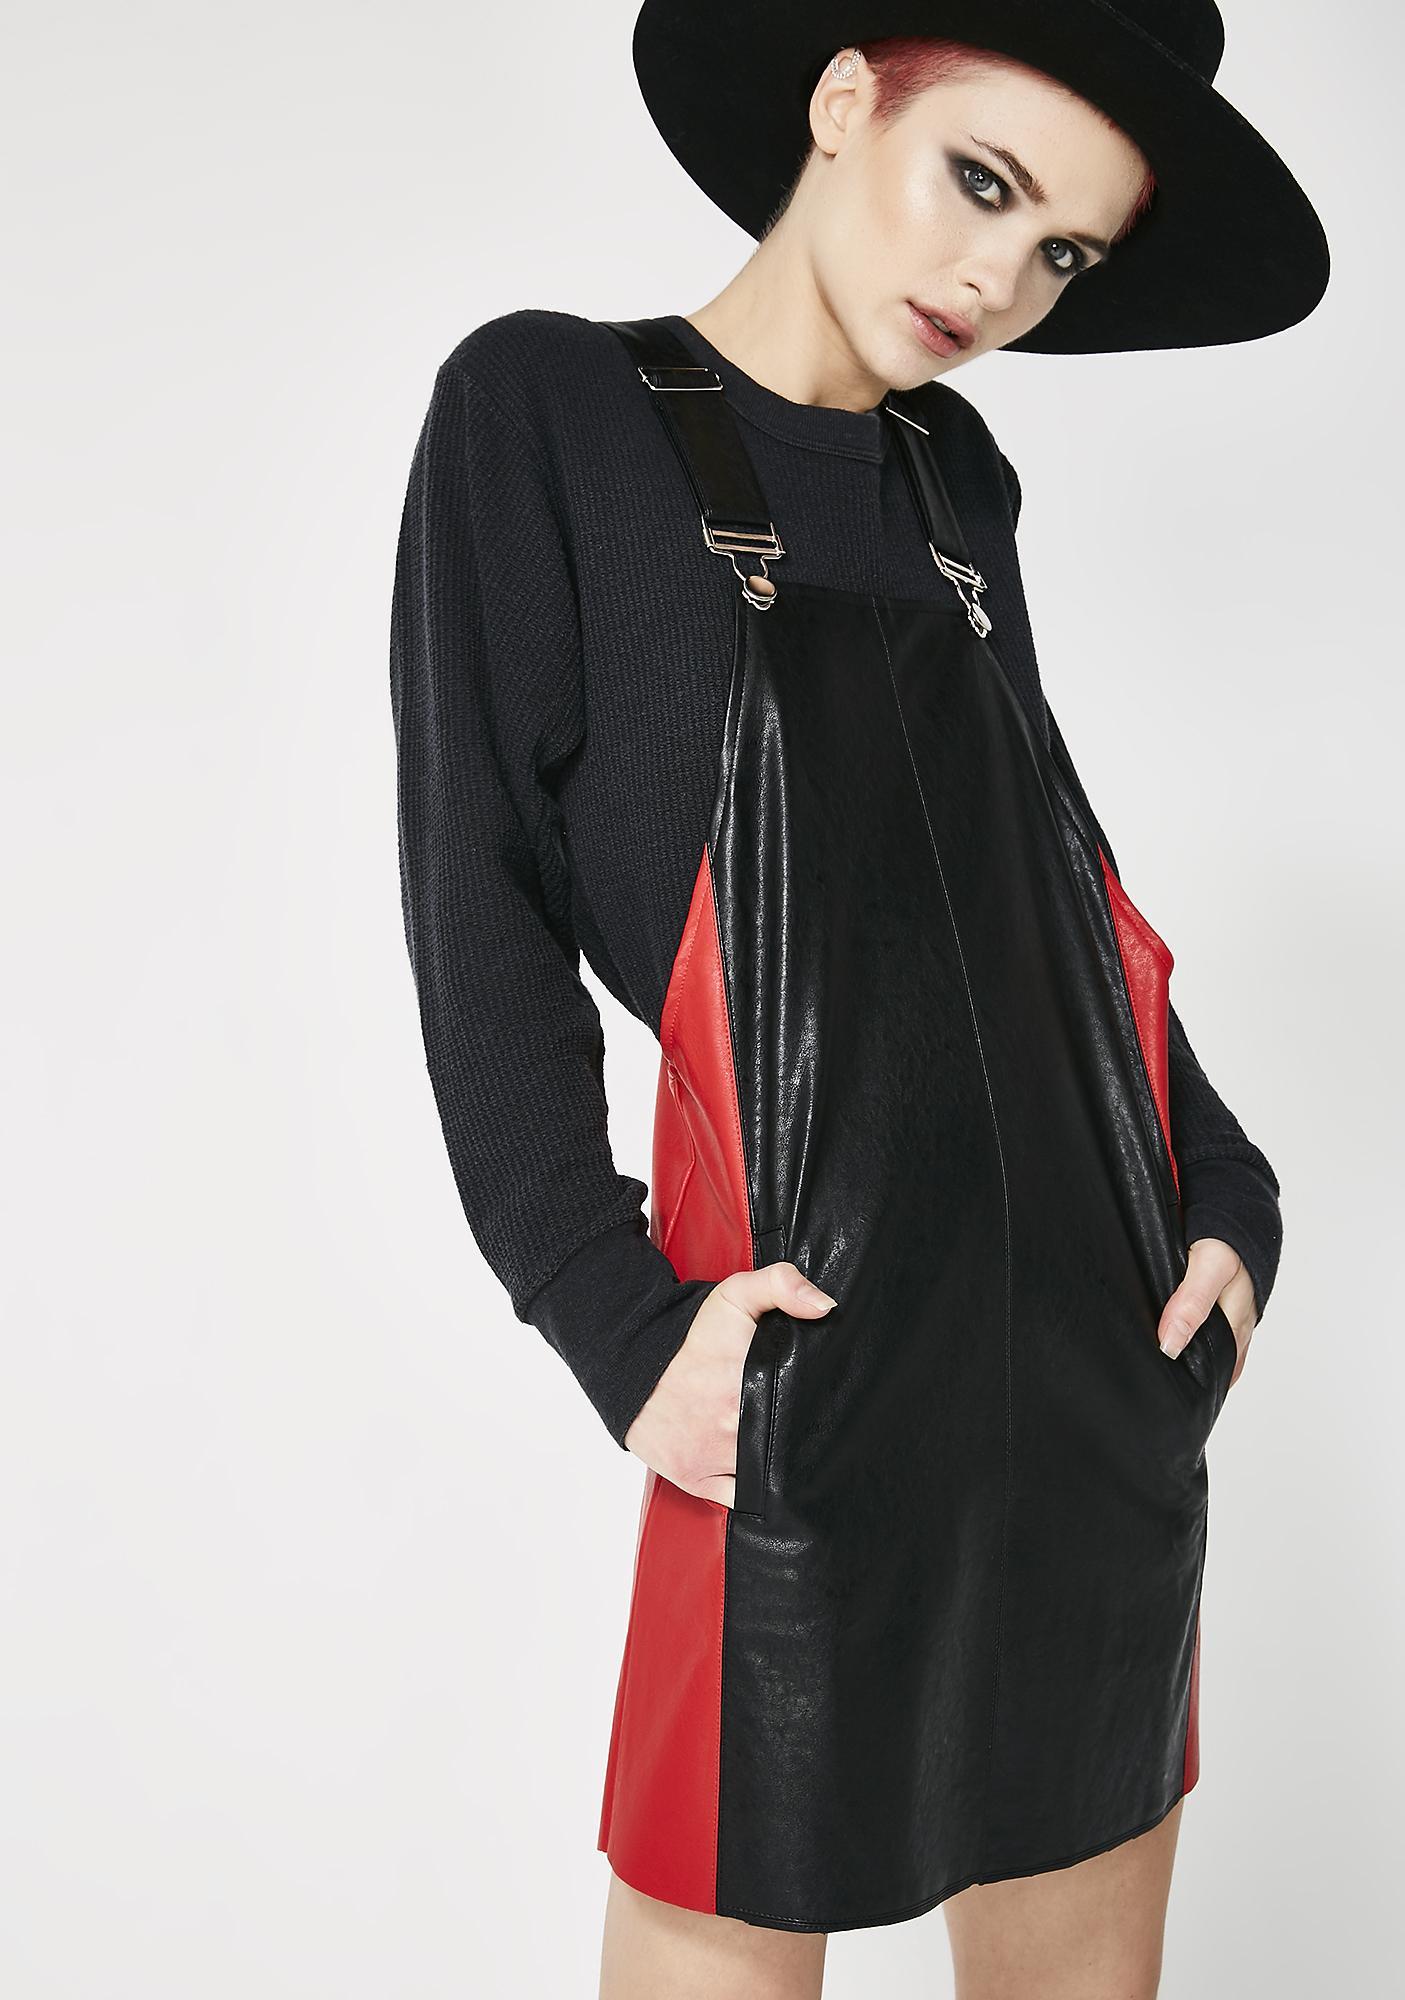 Glamorous Causin' Trouble Pinafore Dress